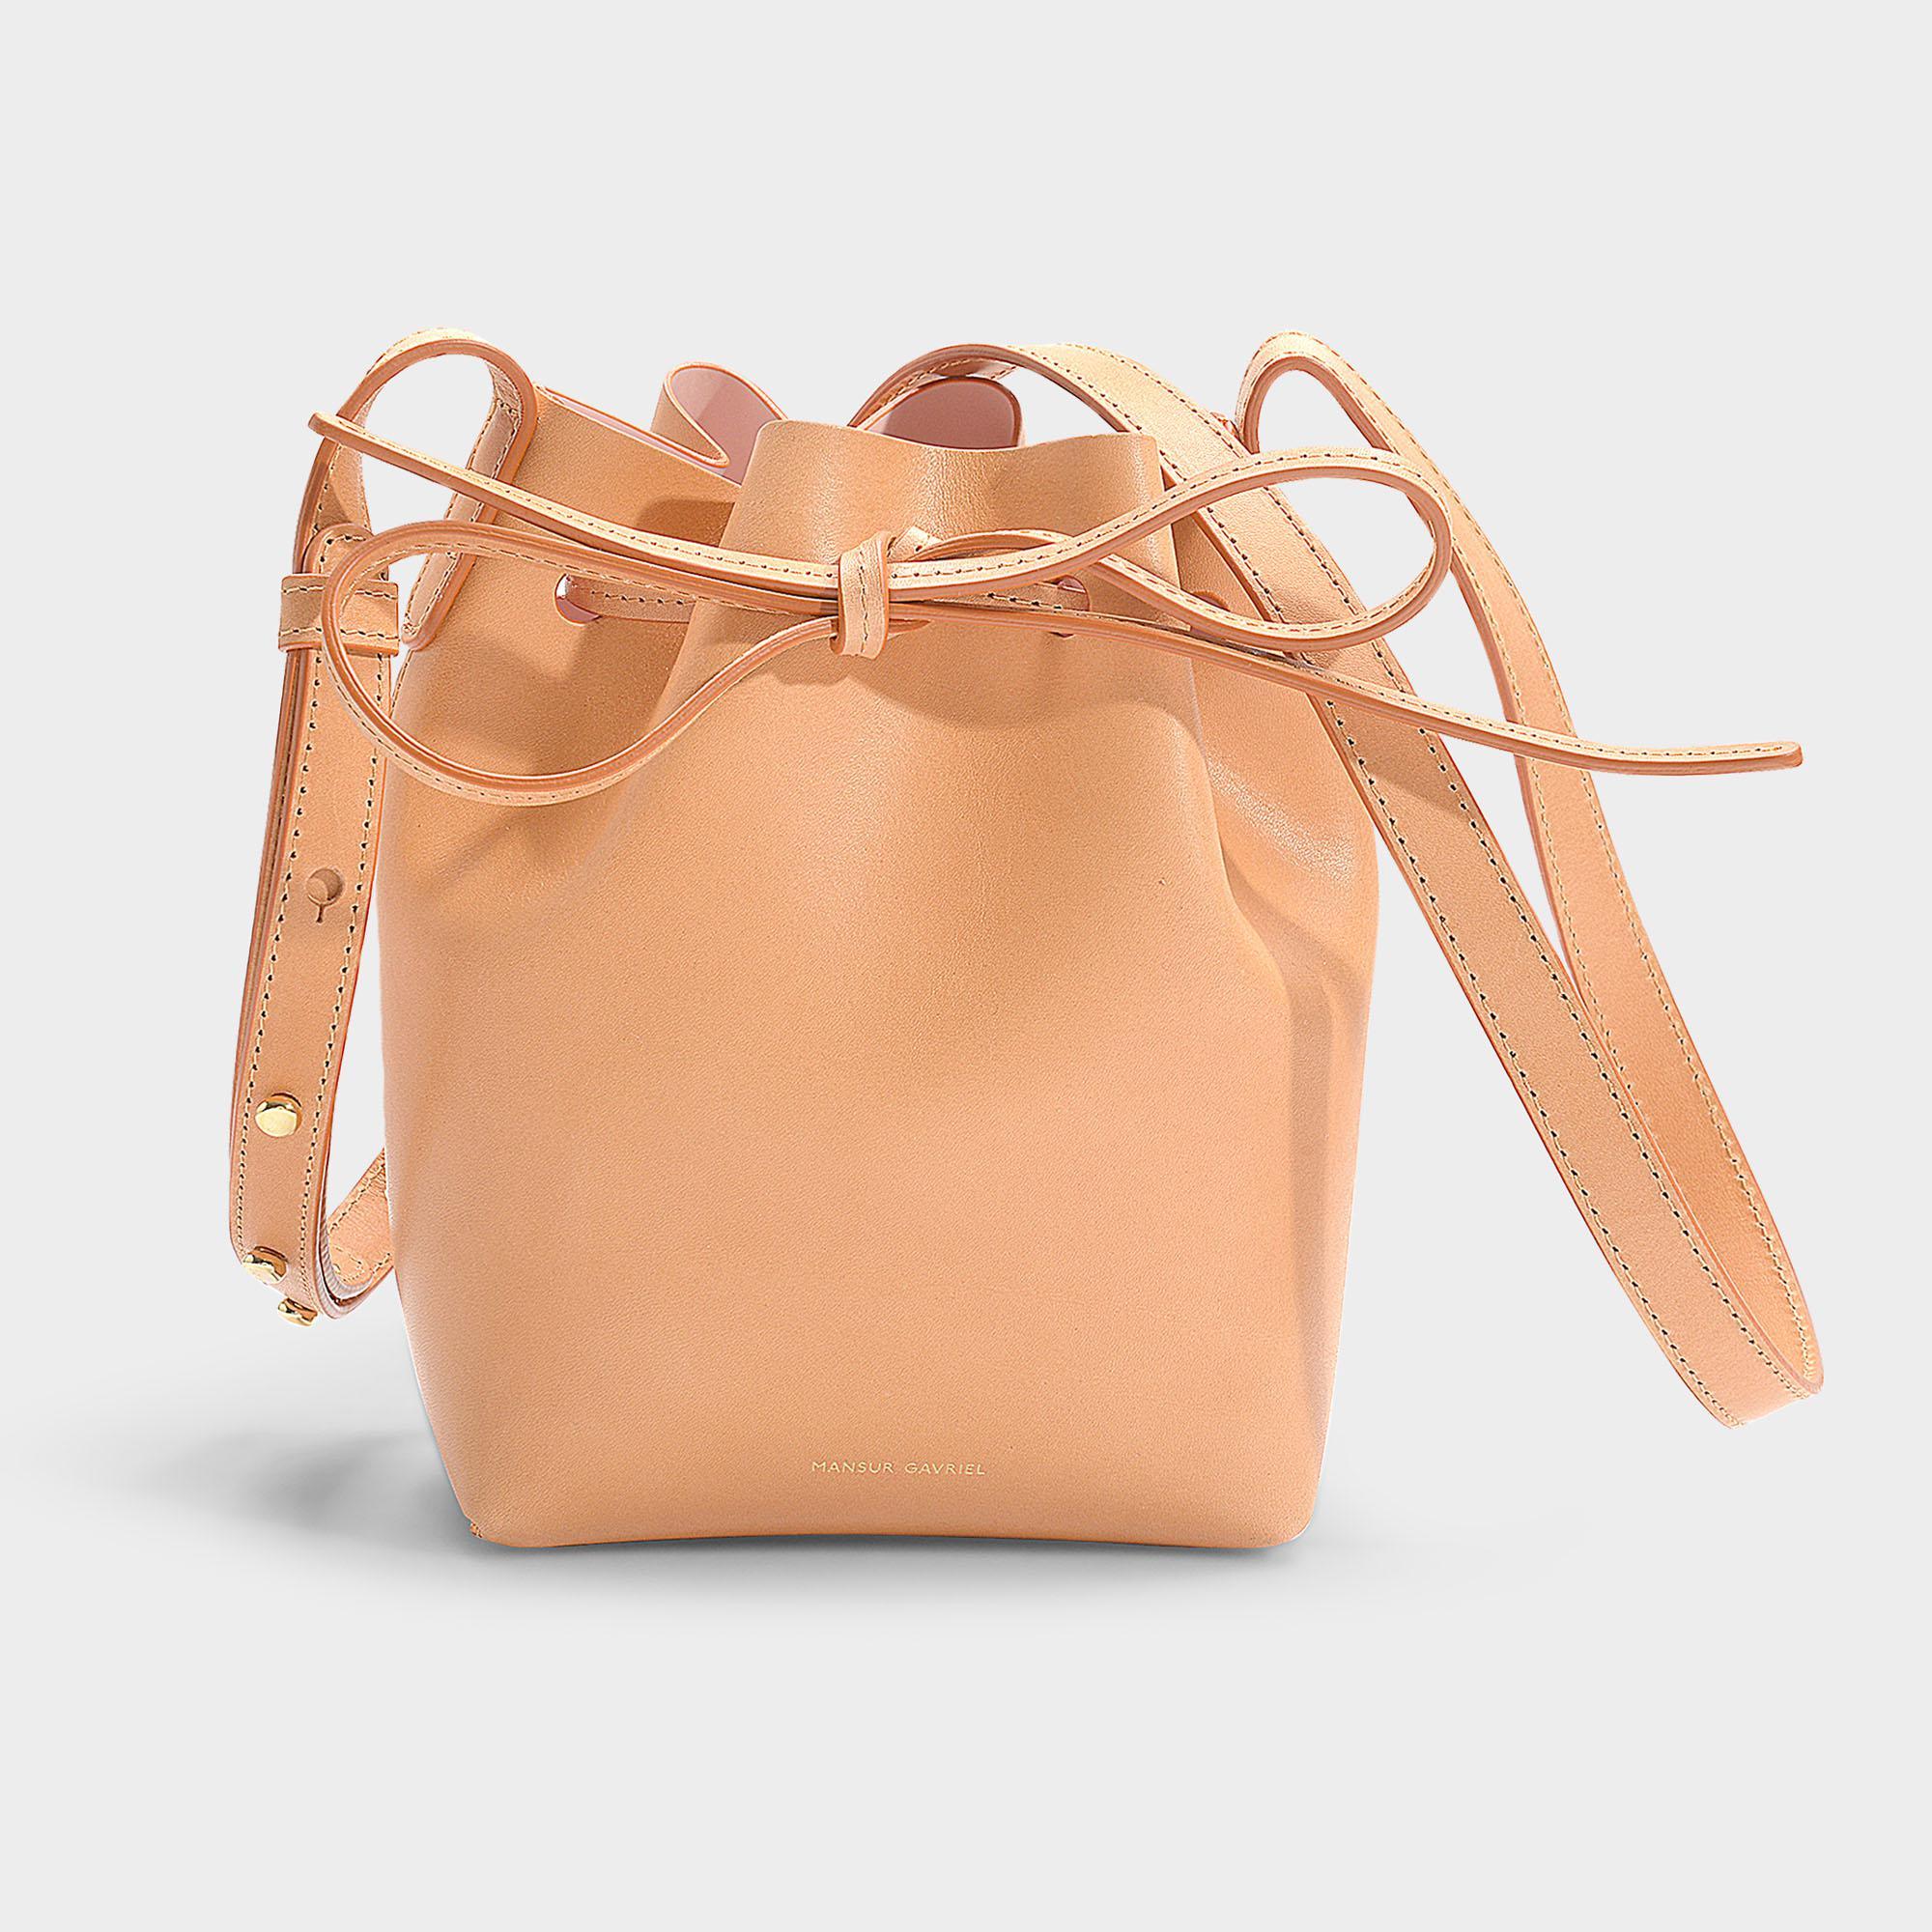 55f324a7a4a6 Mansur Gavriel - Brown Mini Mini Bucket Bag In Beige Calfskin - Lyst. View  fullscreen